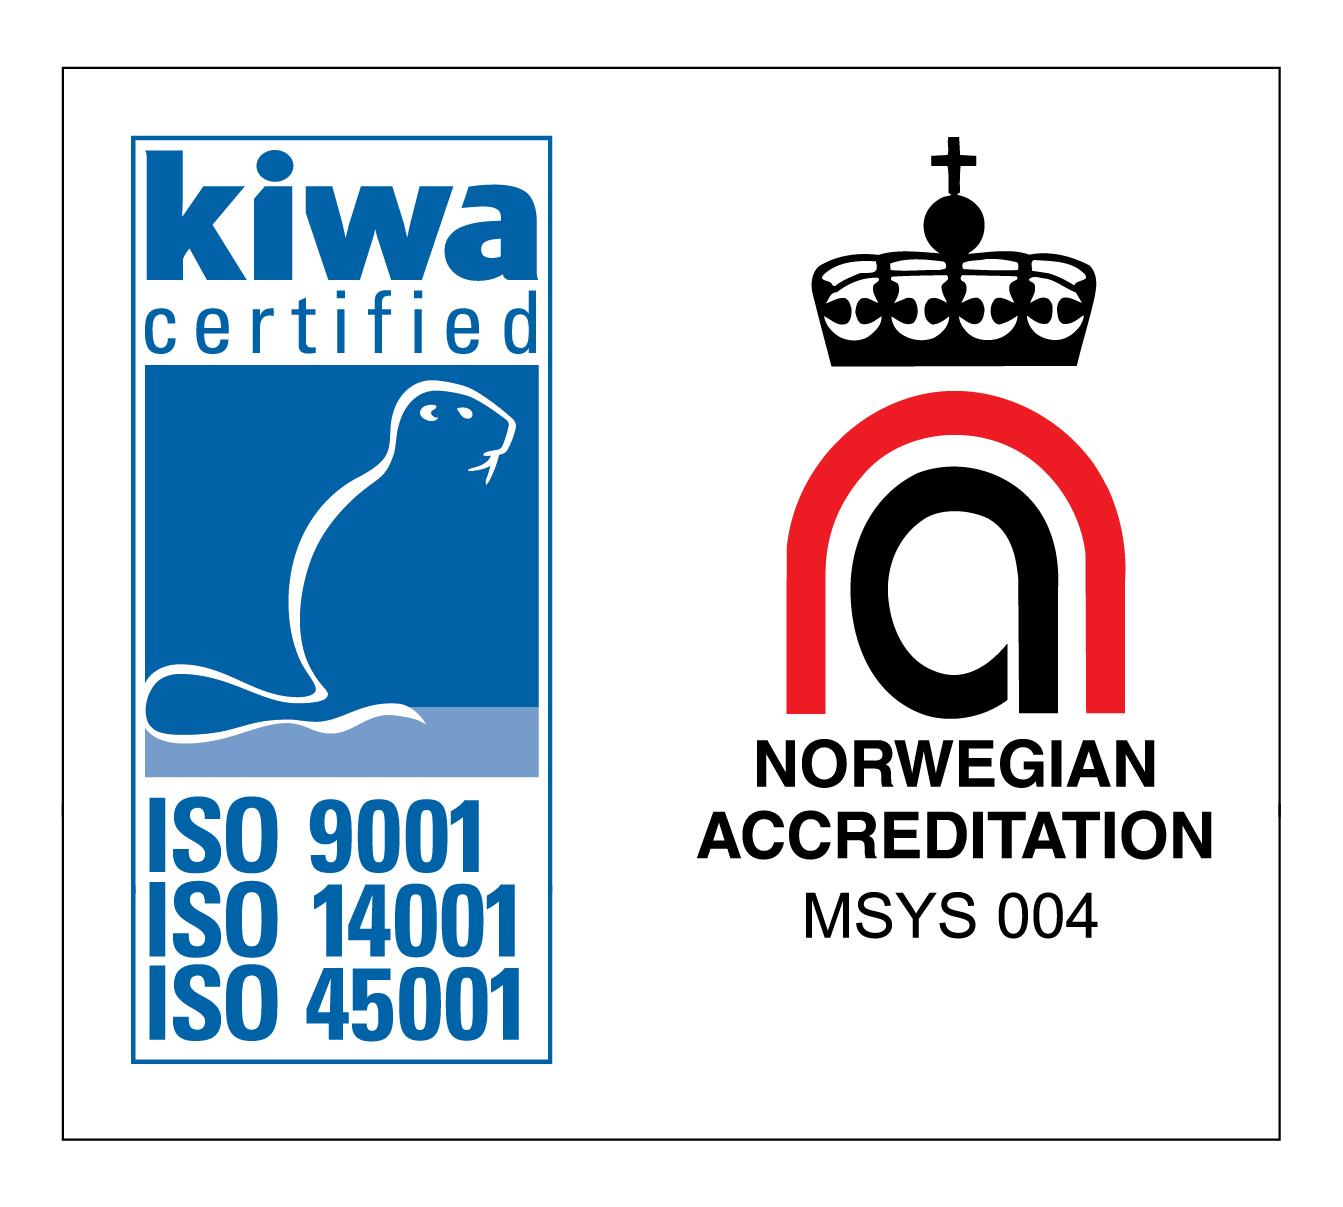 - ISO-Sertifisering